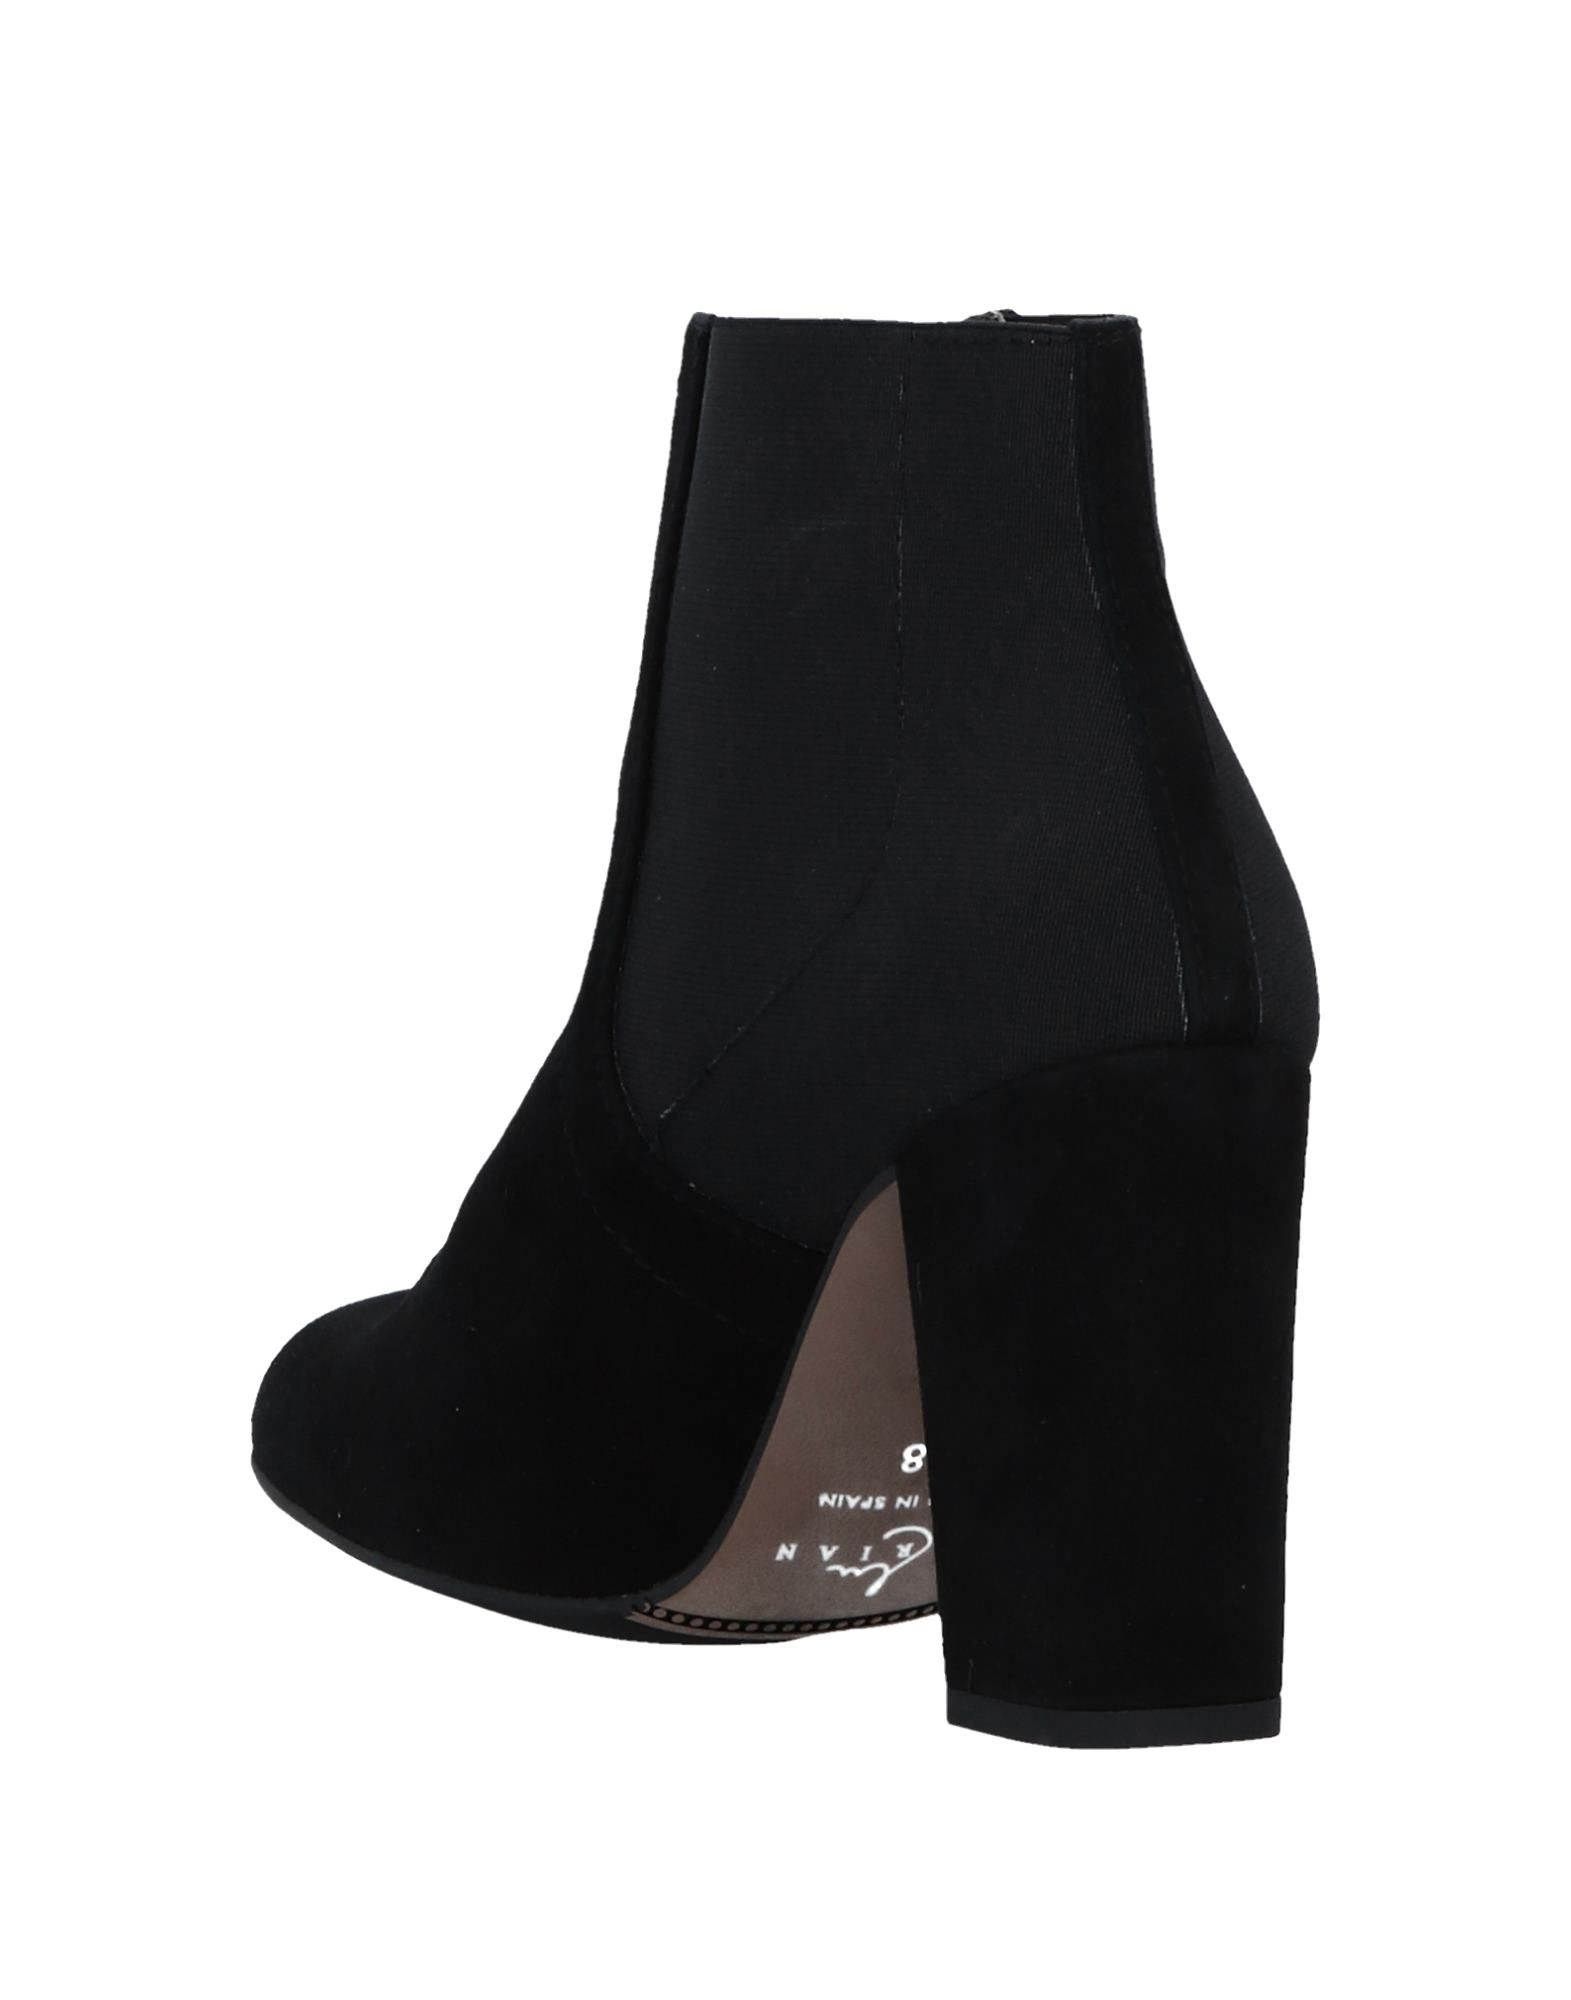 Marian Stiefelette Damen Gute  11520186QW Gute Damen Qualität beliebte Schuhe 8a61dc